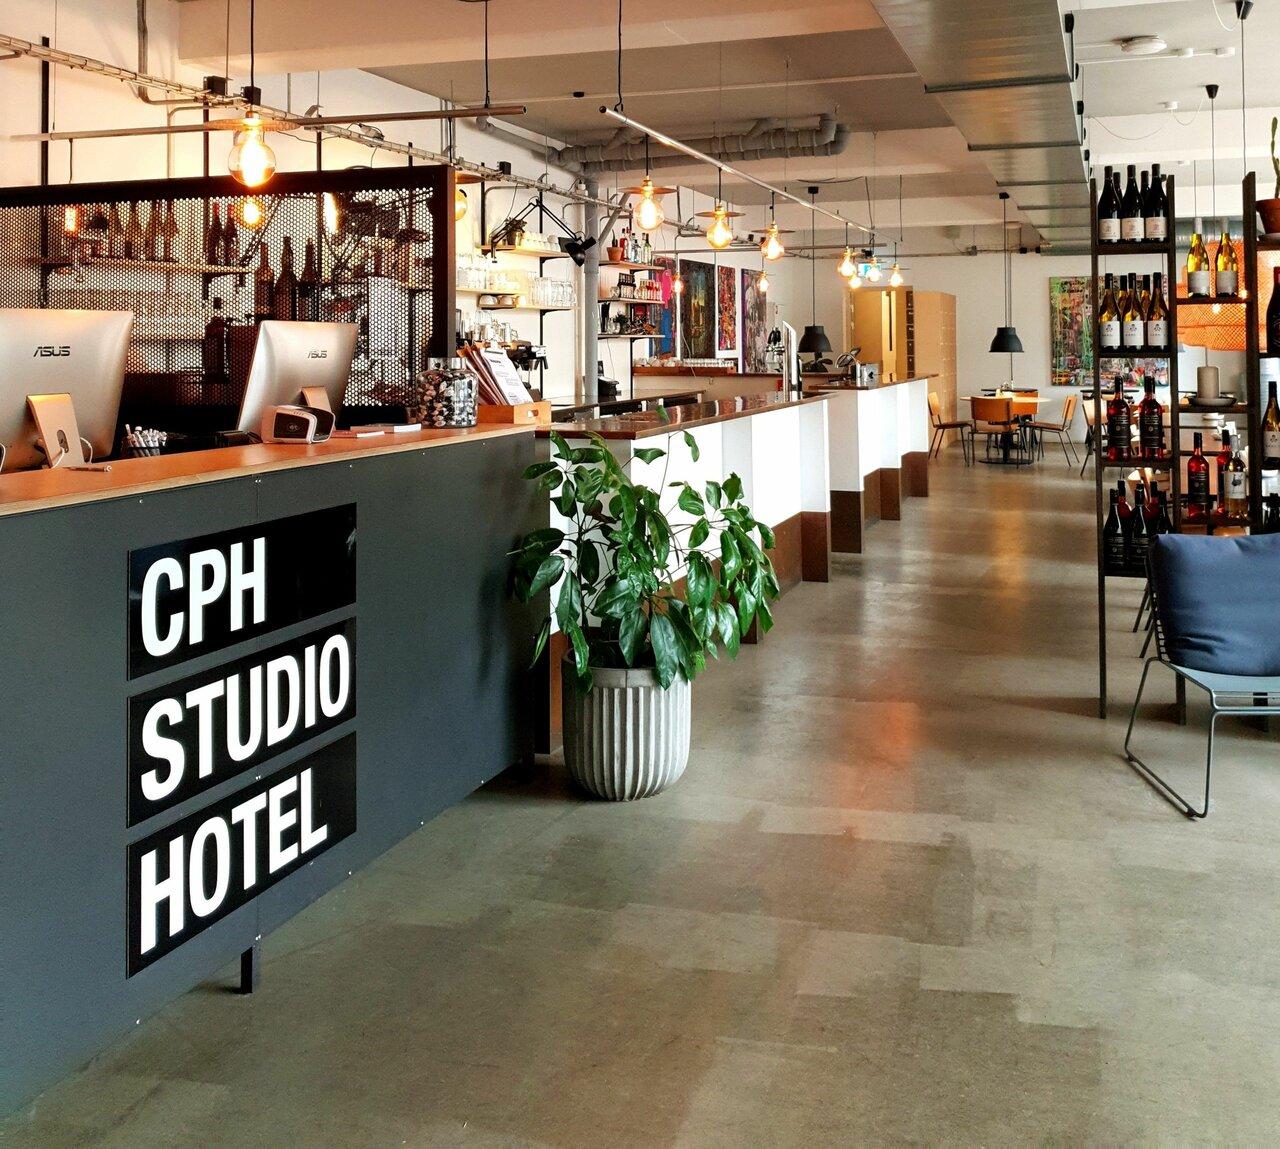 Cph Studio